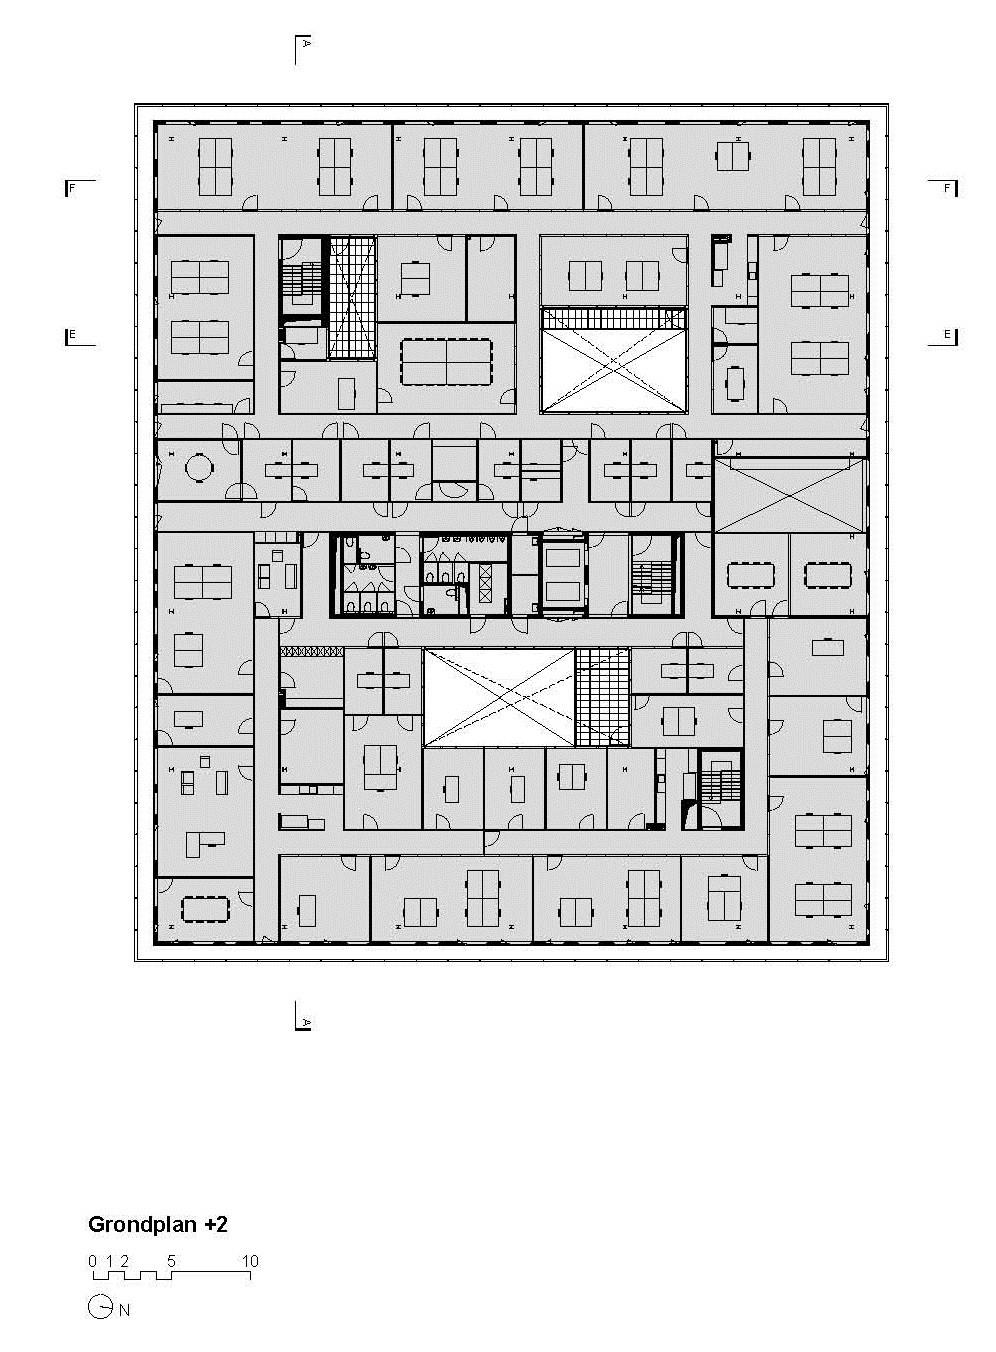 M1009 Cucv Wiring Diagram | Wiring Liry on